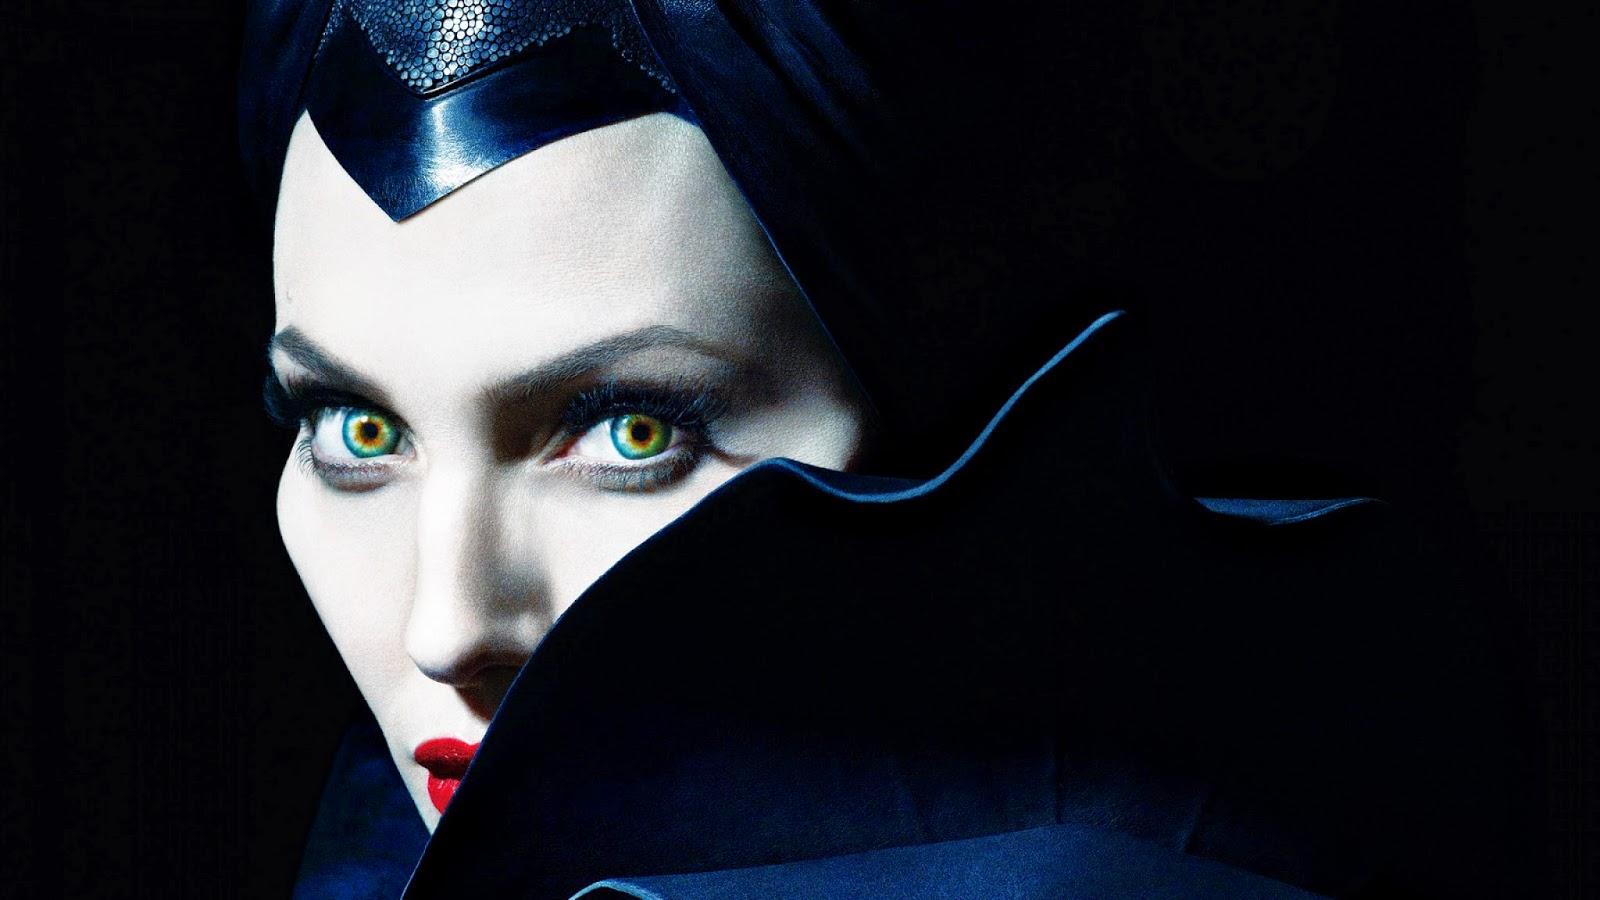 Angelina Jolie's Look in Maleficent